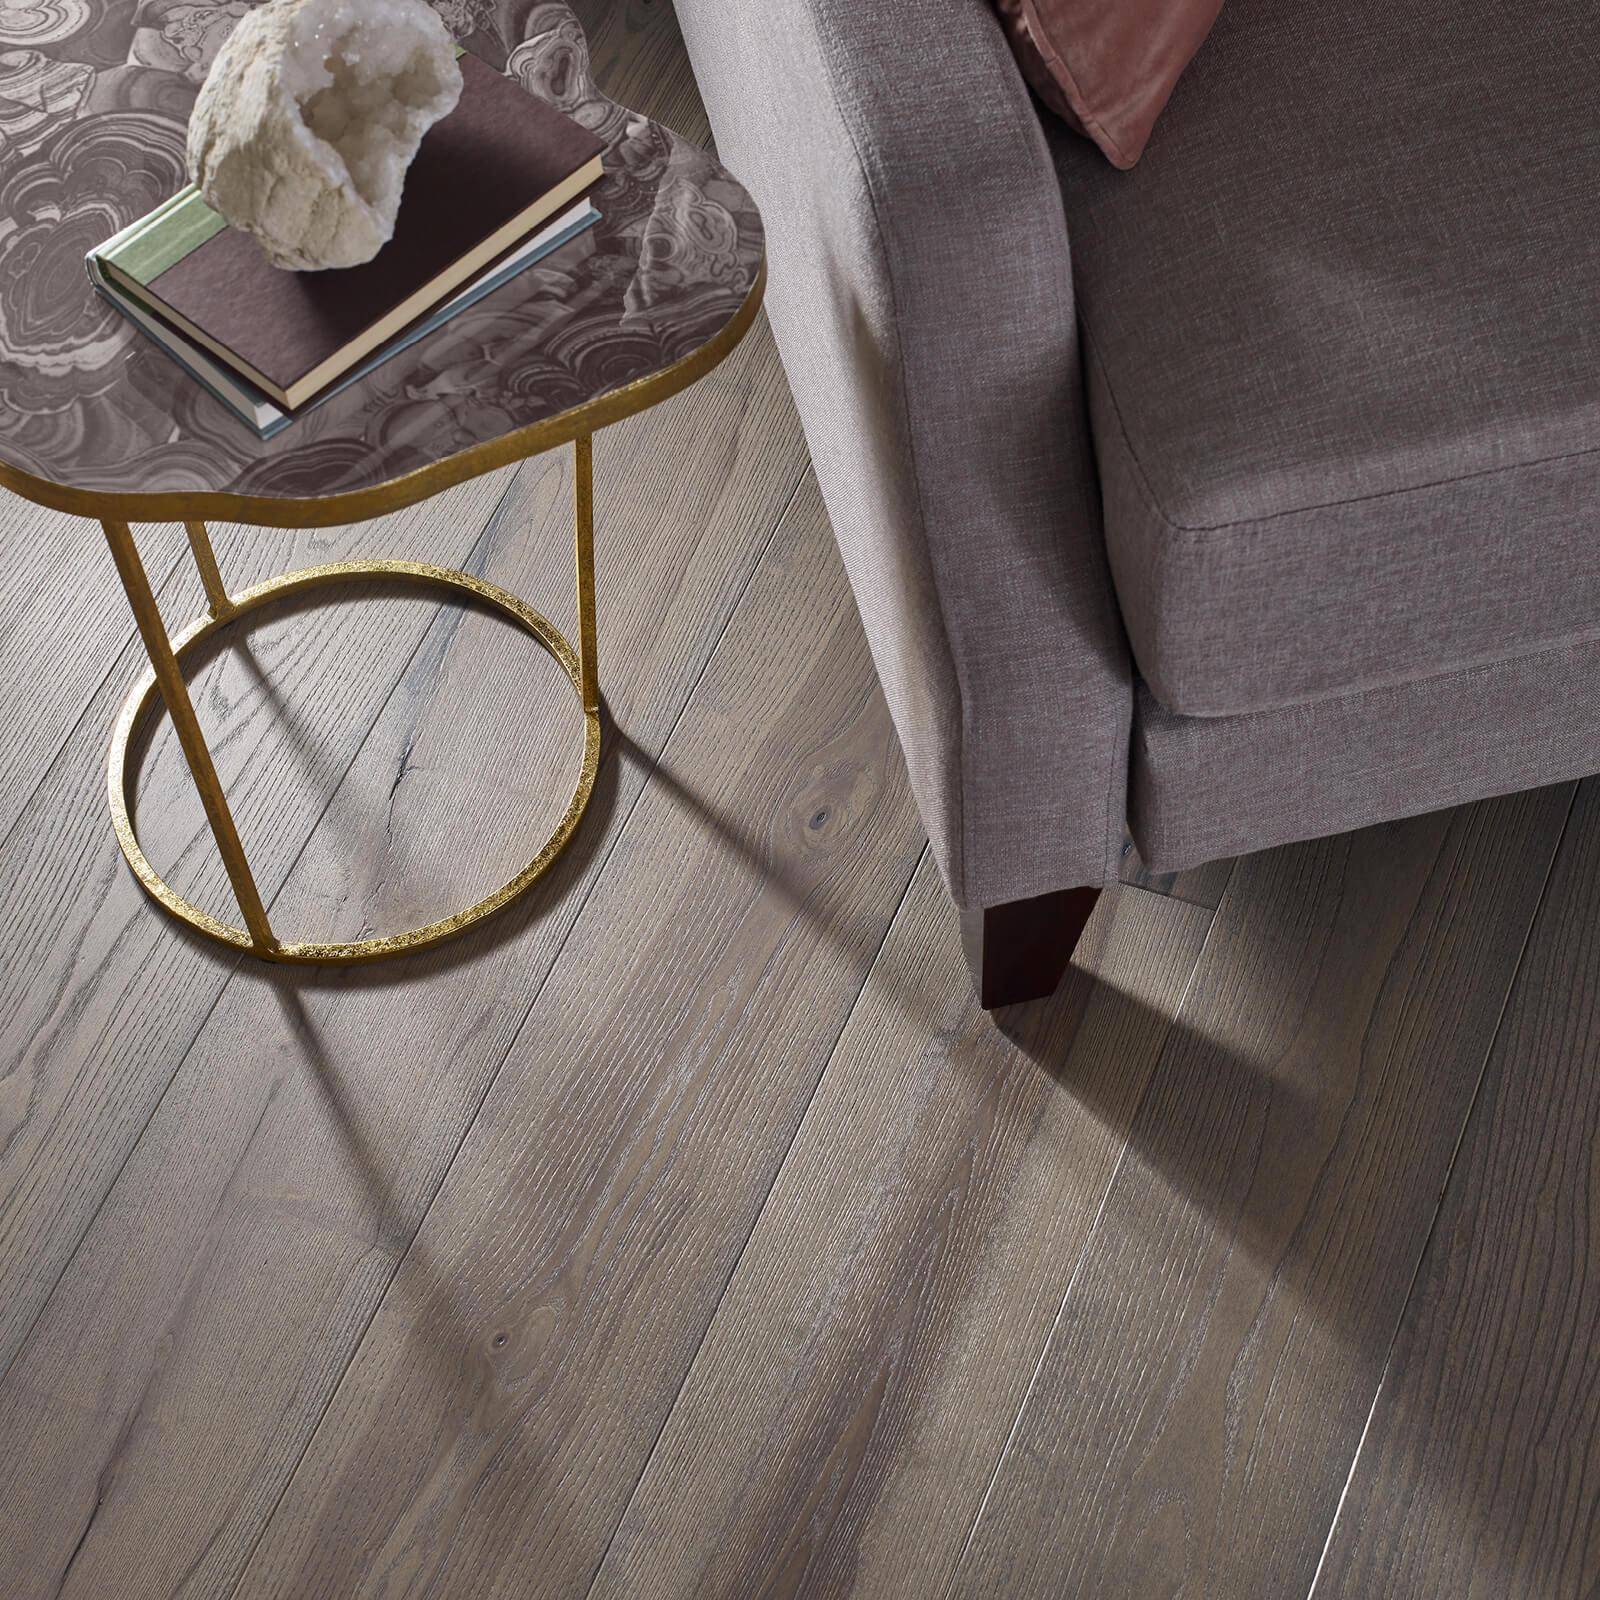 Reflections ash | McSwain Carpet & Floors